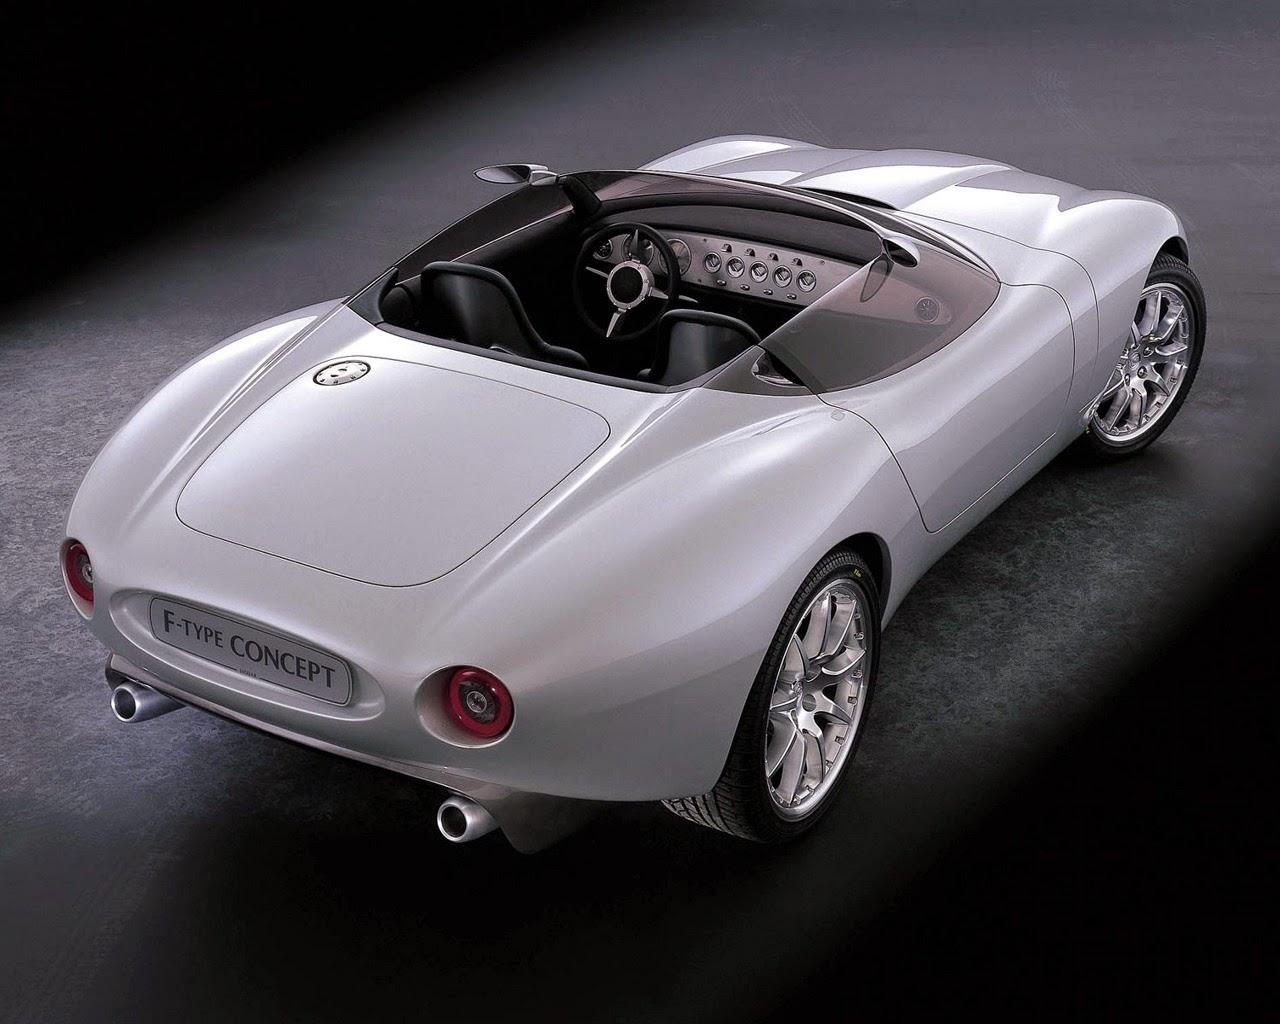 Jaguar F Type Concept Top View Wallpapers Sport Cars Hd Wallpaper